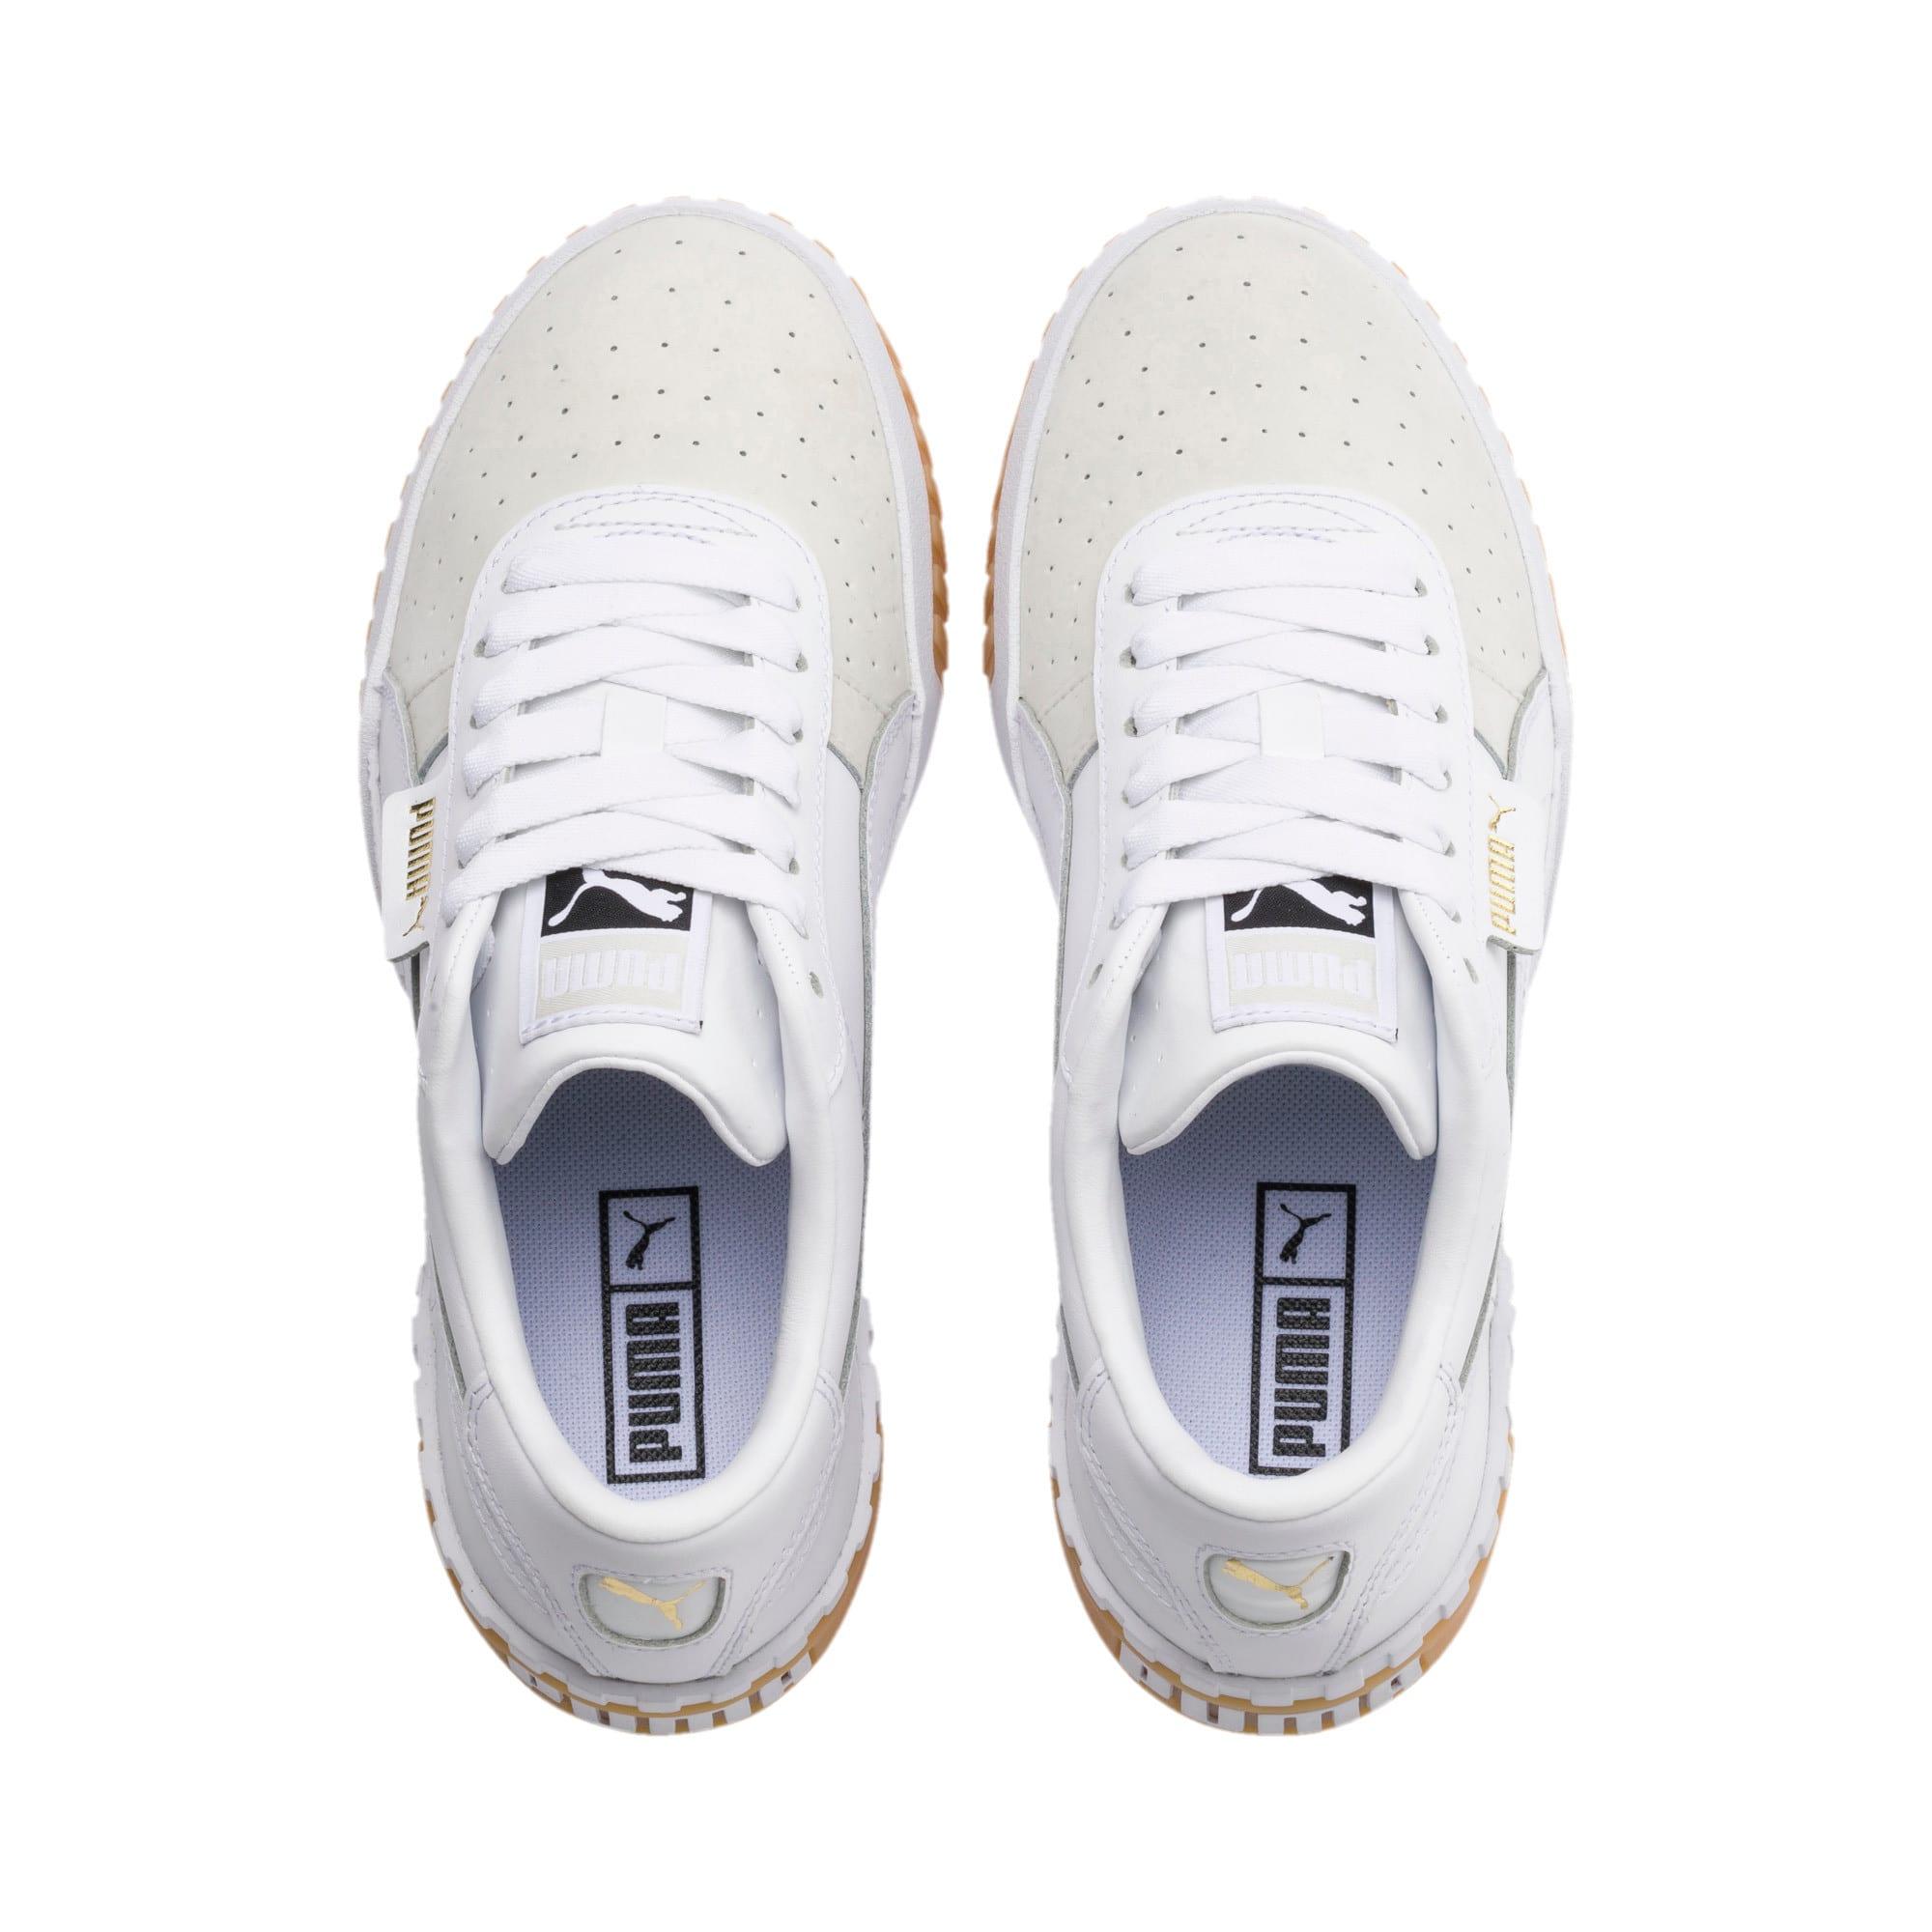 Thumbnail 6 of Cali Exotic Damen Sneaker, Puma White-Puma White, medium